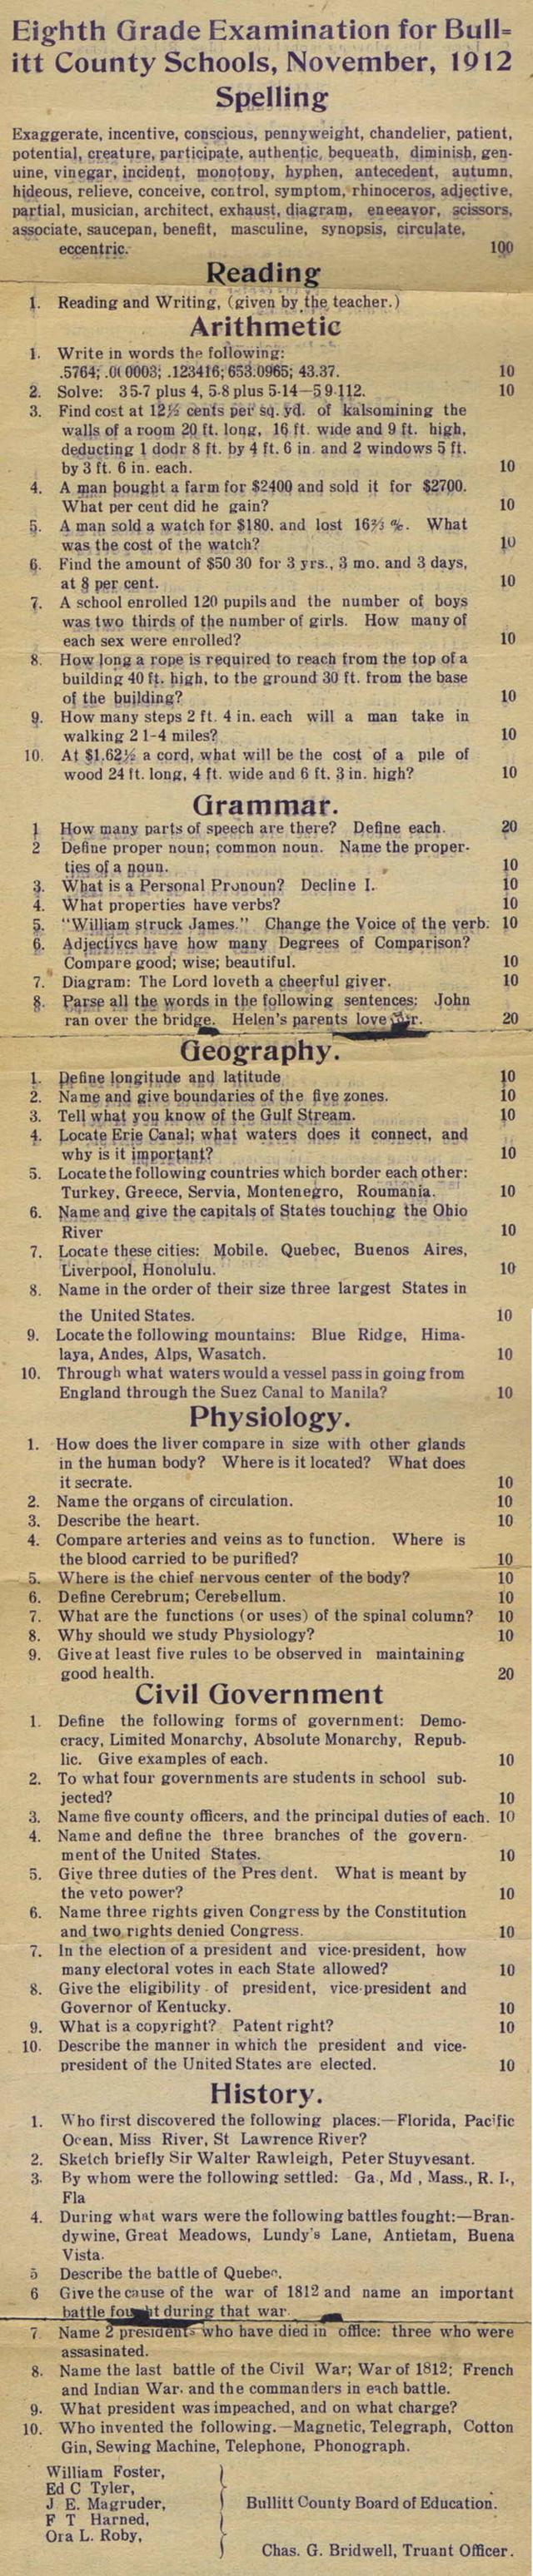 bcschoolexam1912sm--1-